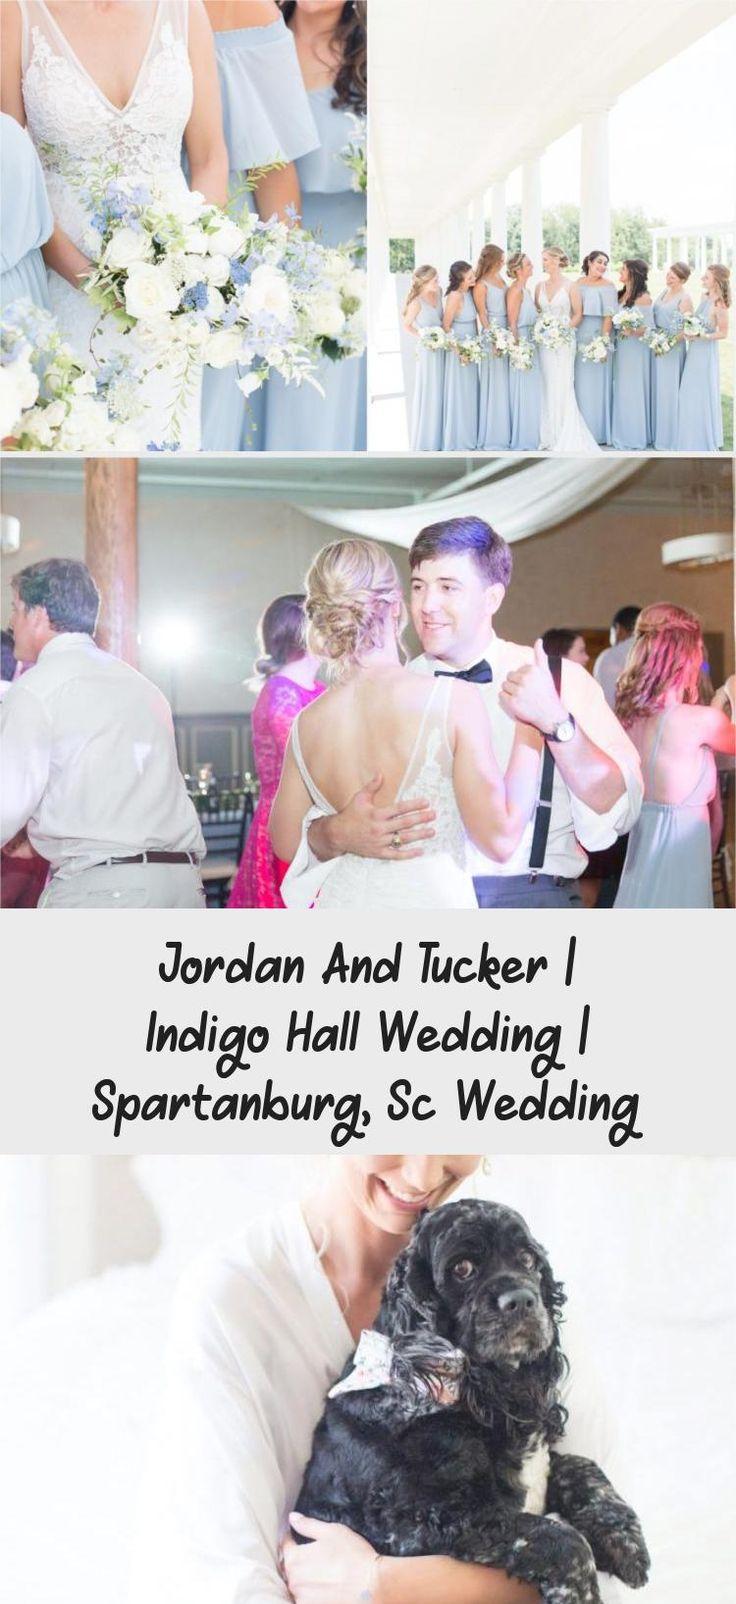 Indigo Hall Spartanburg Wedding | Greenville, SC Wedding Photographer | Christa Rene Photography #DavidsBridalBridesmaidDresses #WhiteBridesmaidDresses #SimpleBridesmaidDresses #TanBridesmaidDresses #BridesmaidDressesPurple